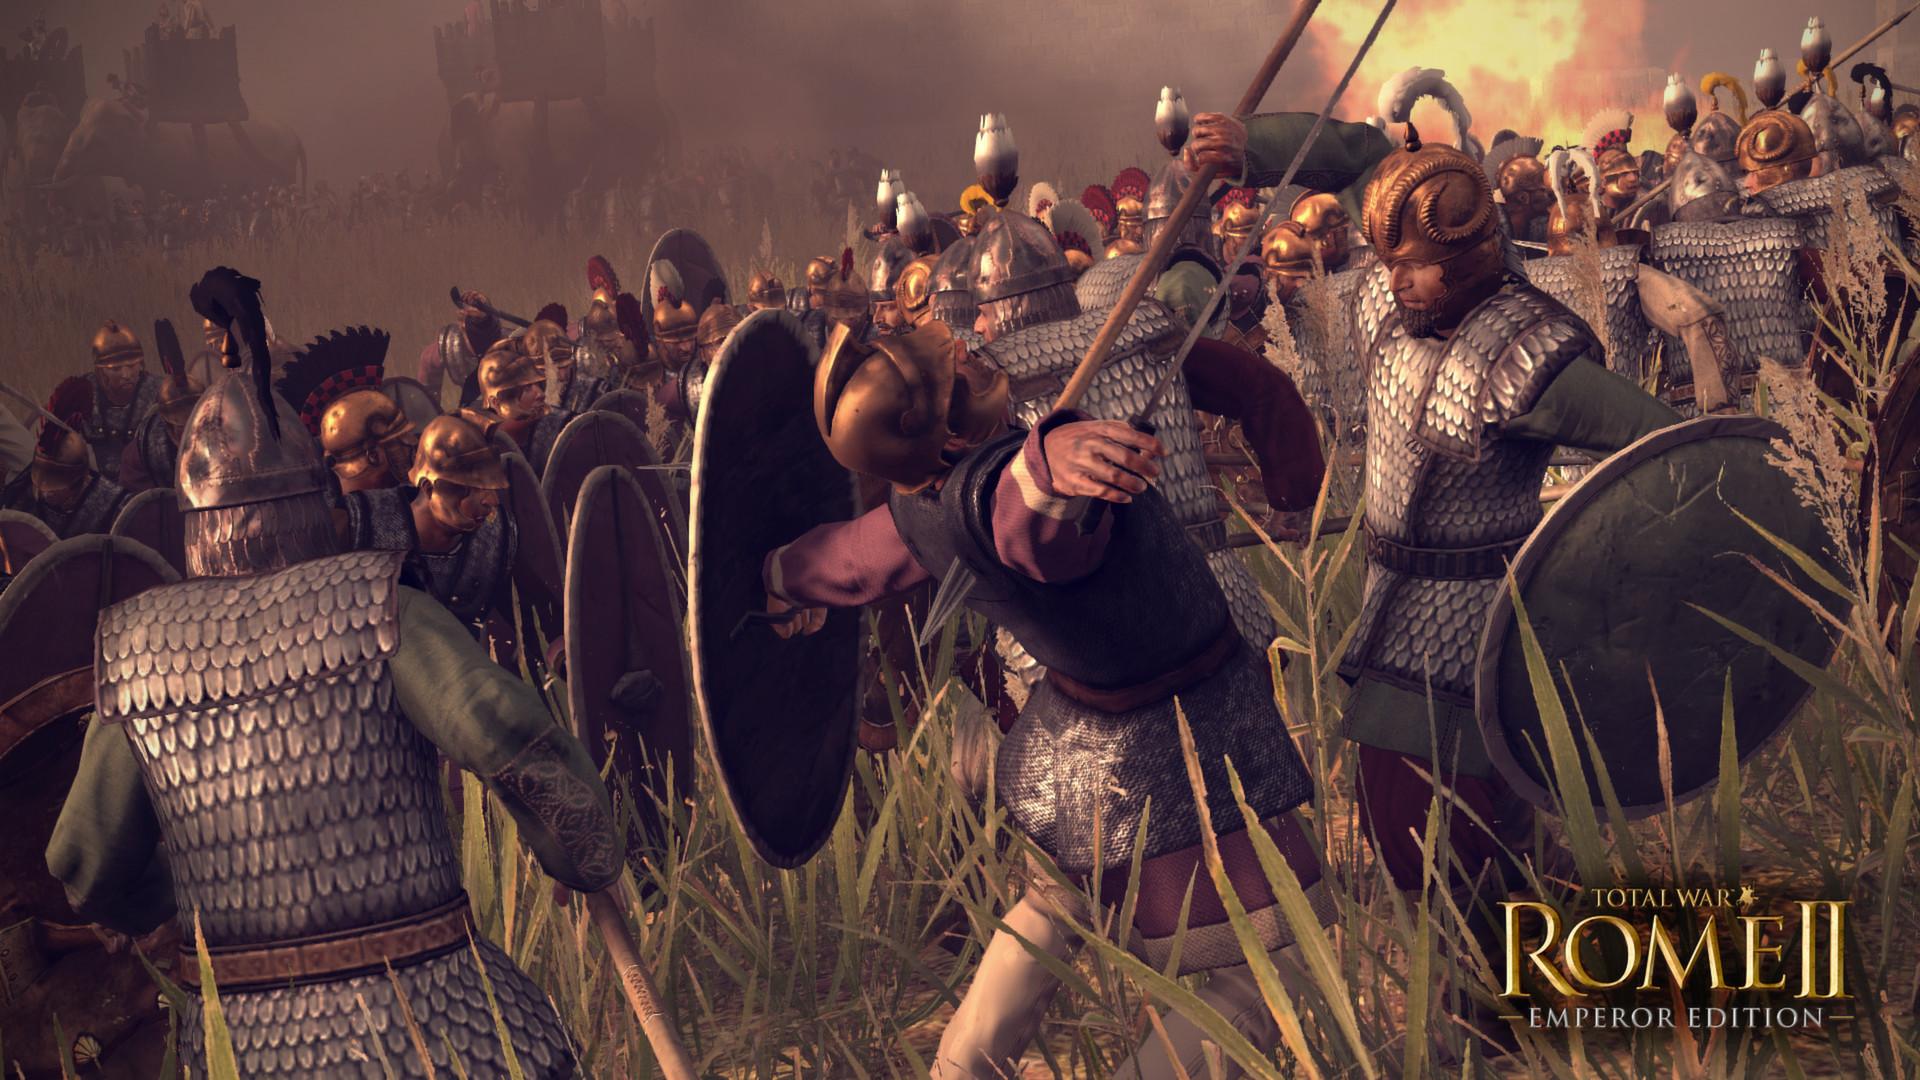 Total war shogun 2 torrent download crotorrents.